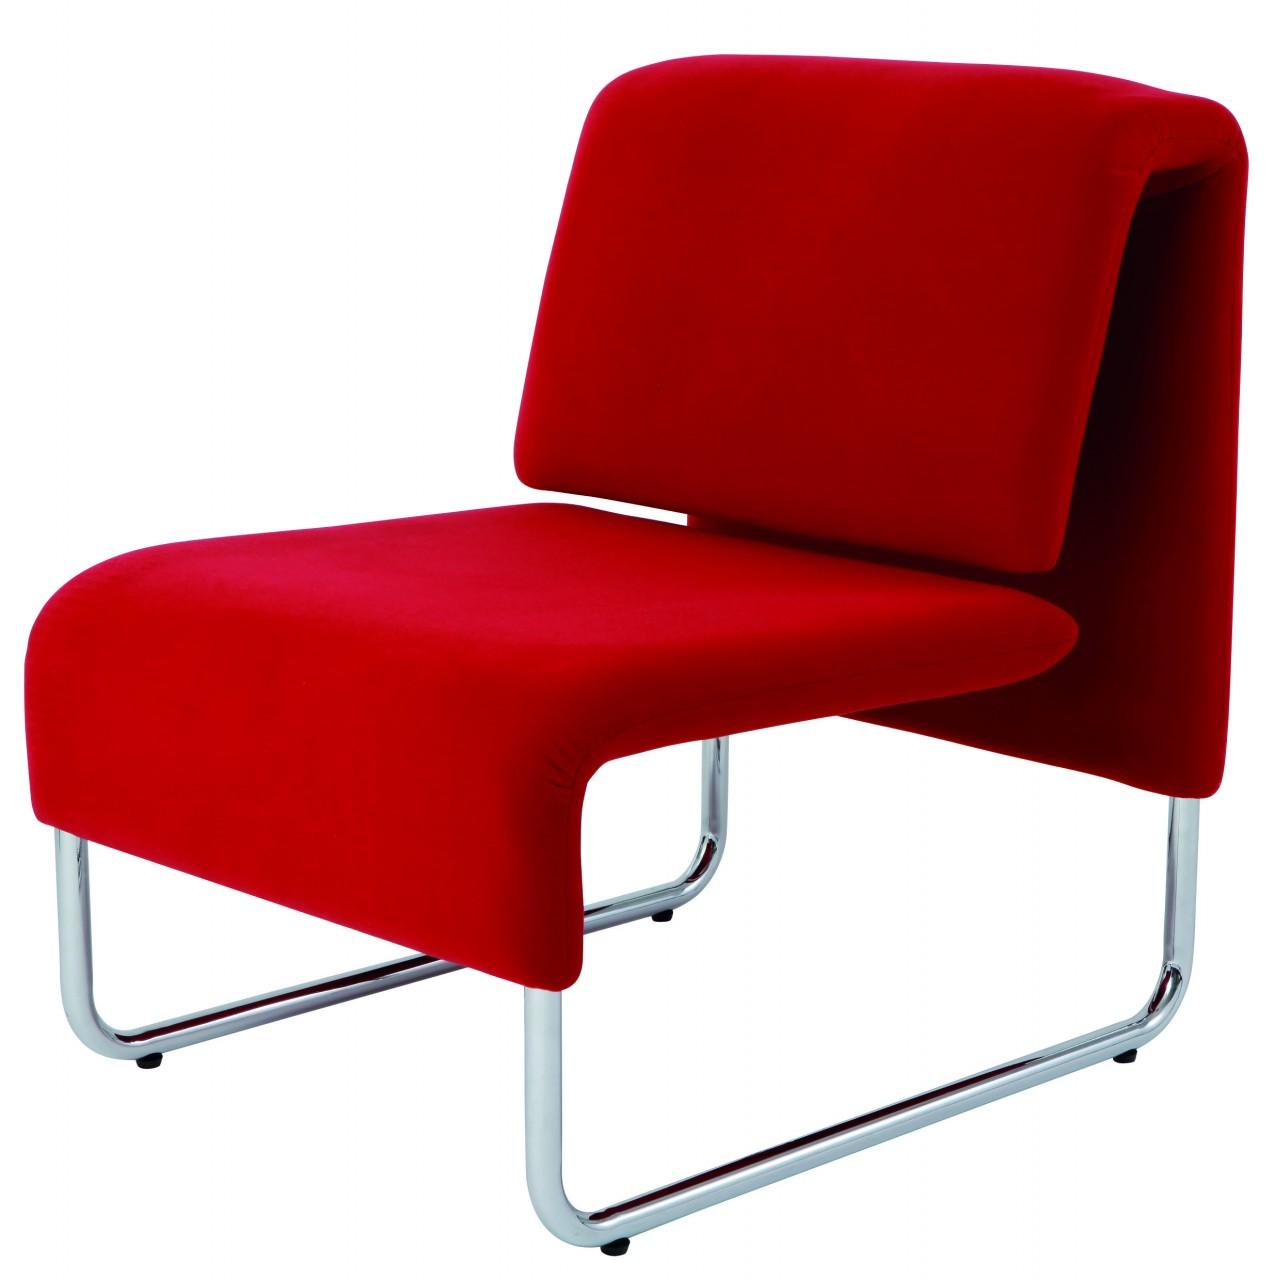 fauteuil d accueil fortis